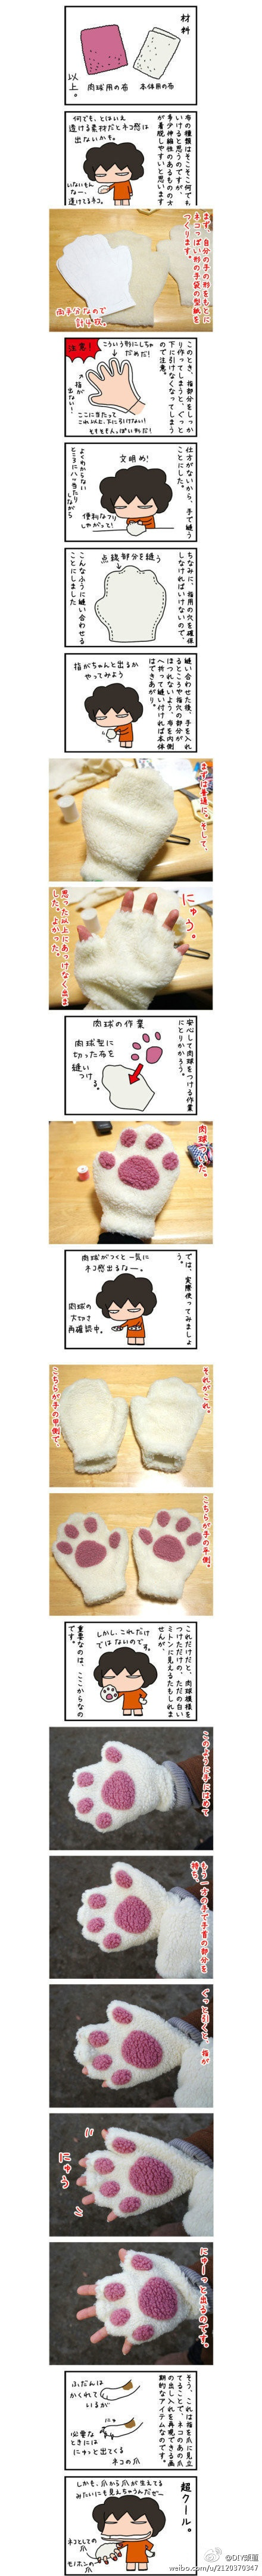 DIY cat gloves!!